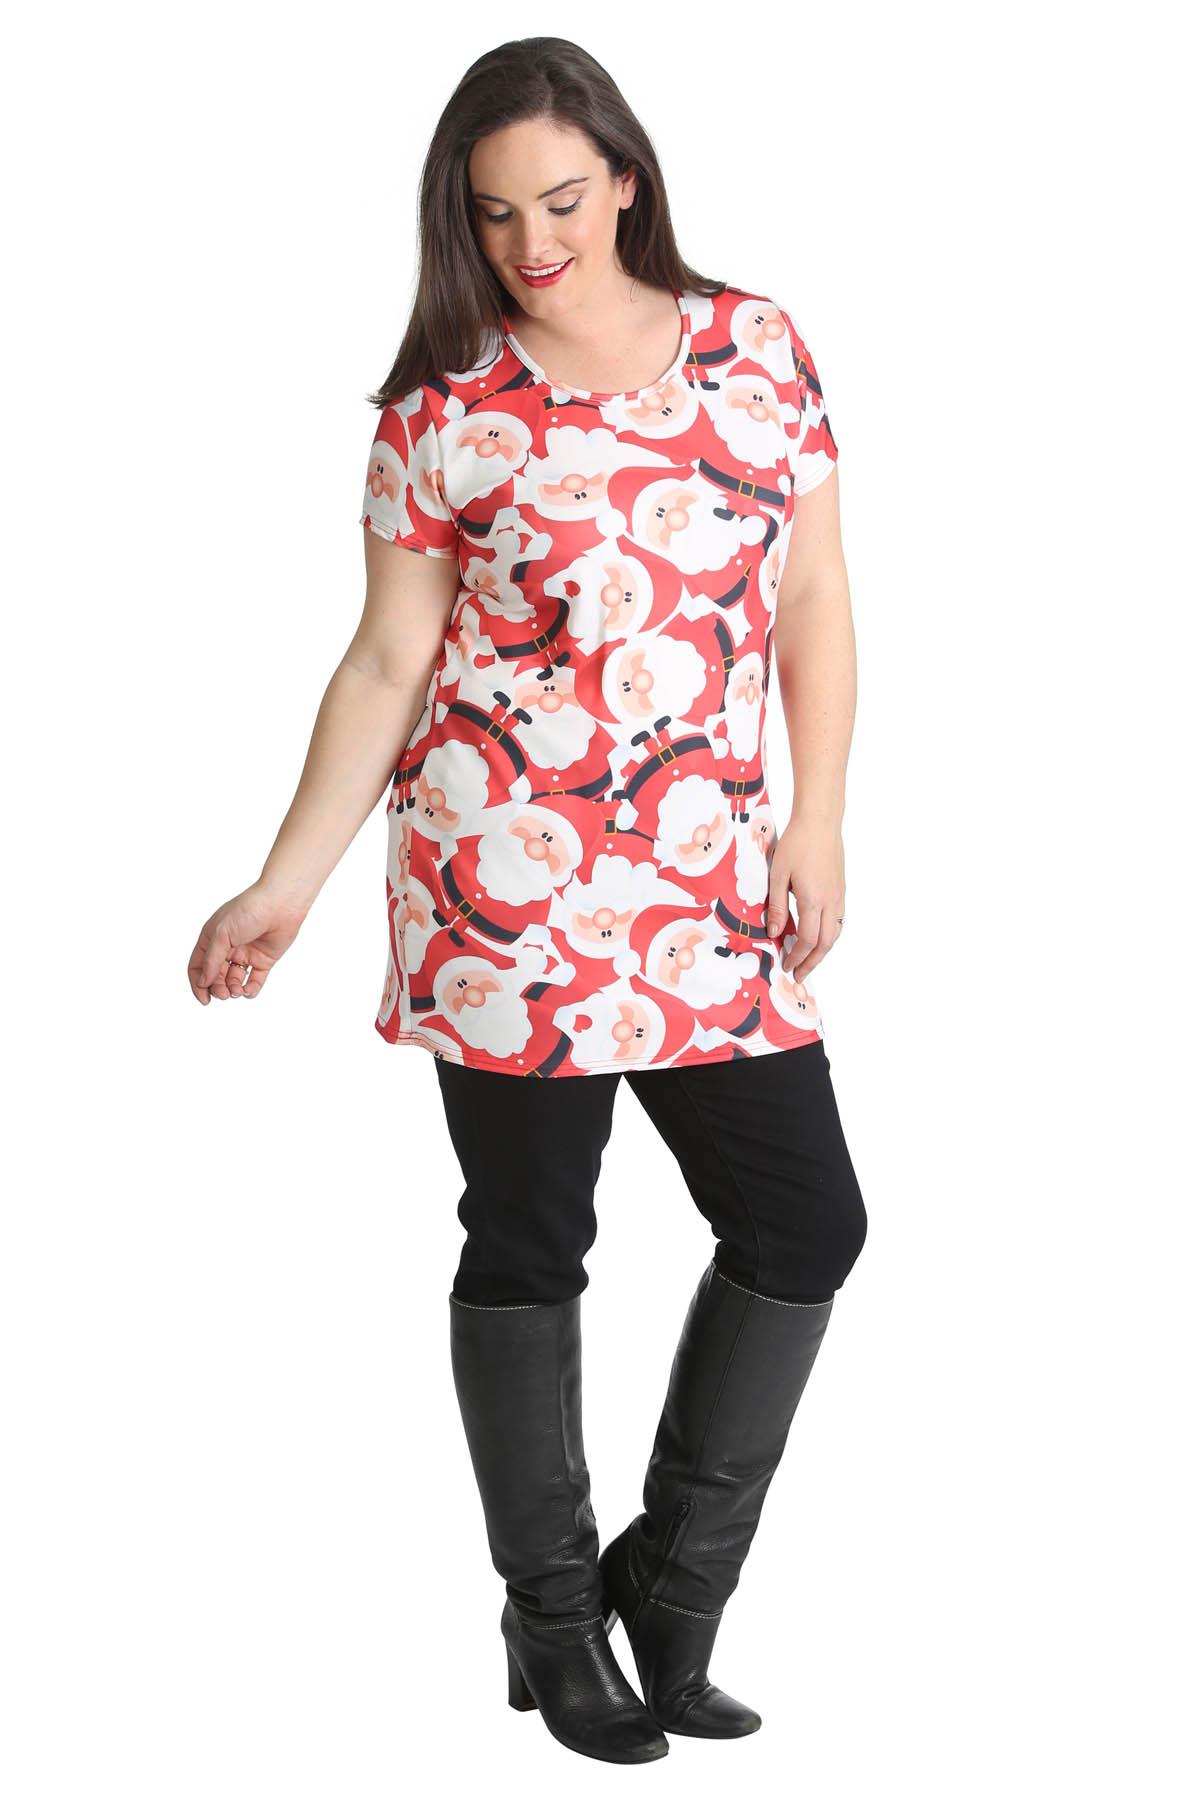 New womens top ladies plus size christmas santa print t for Plus size womens shirts